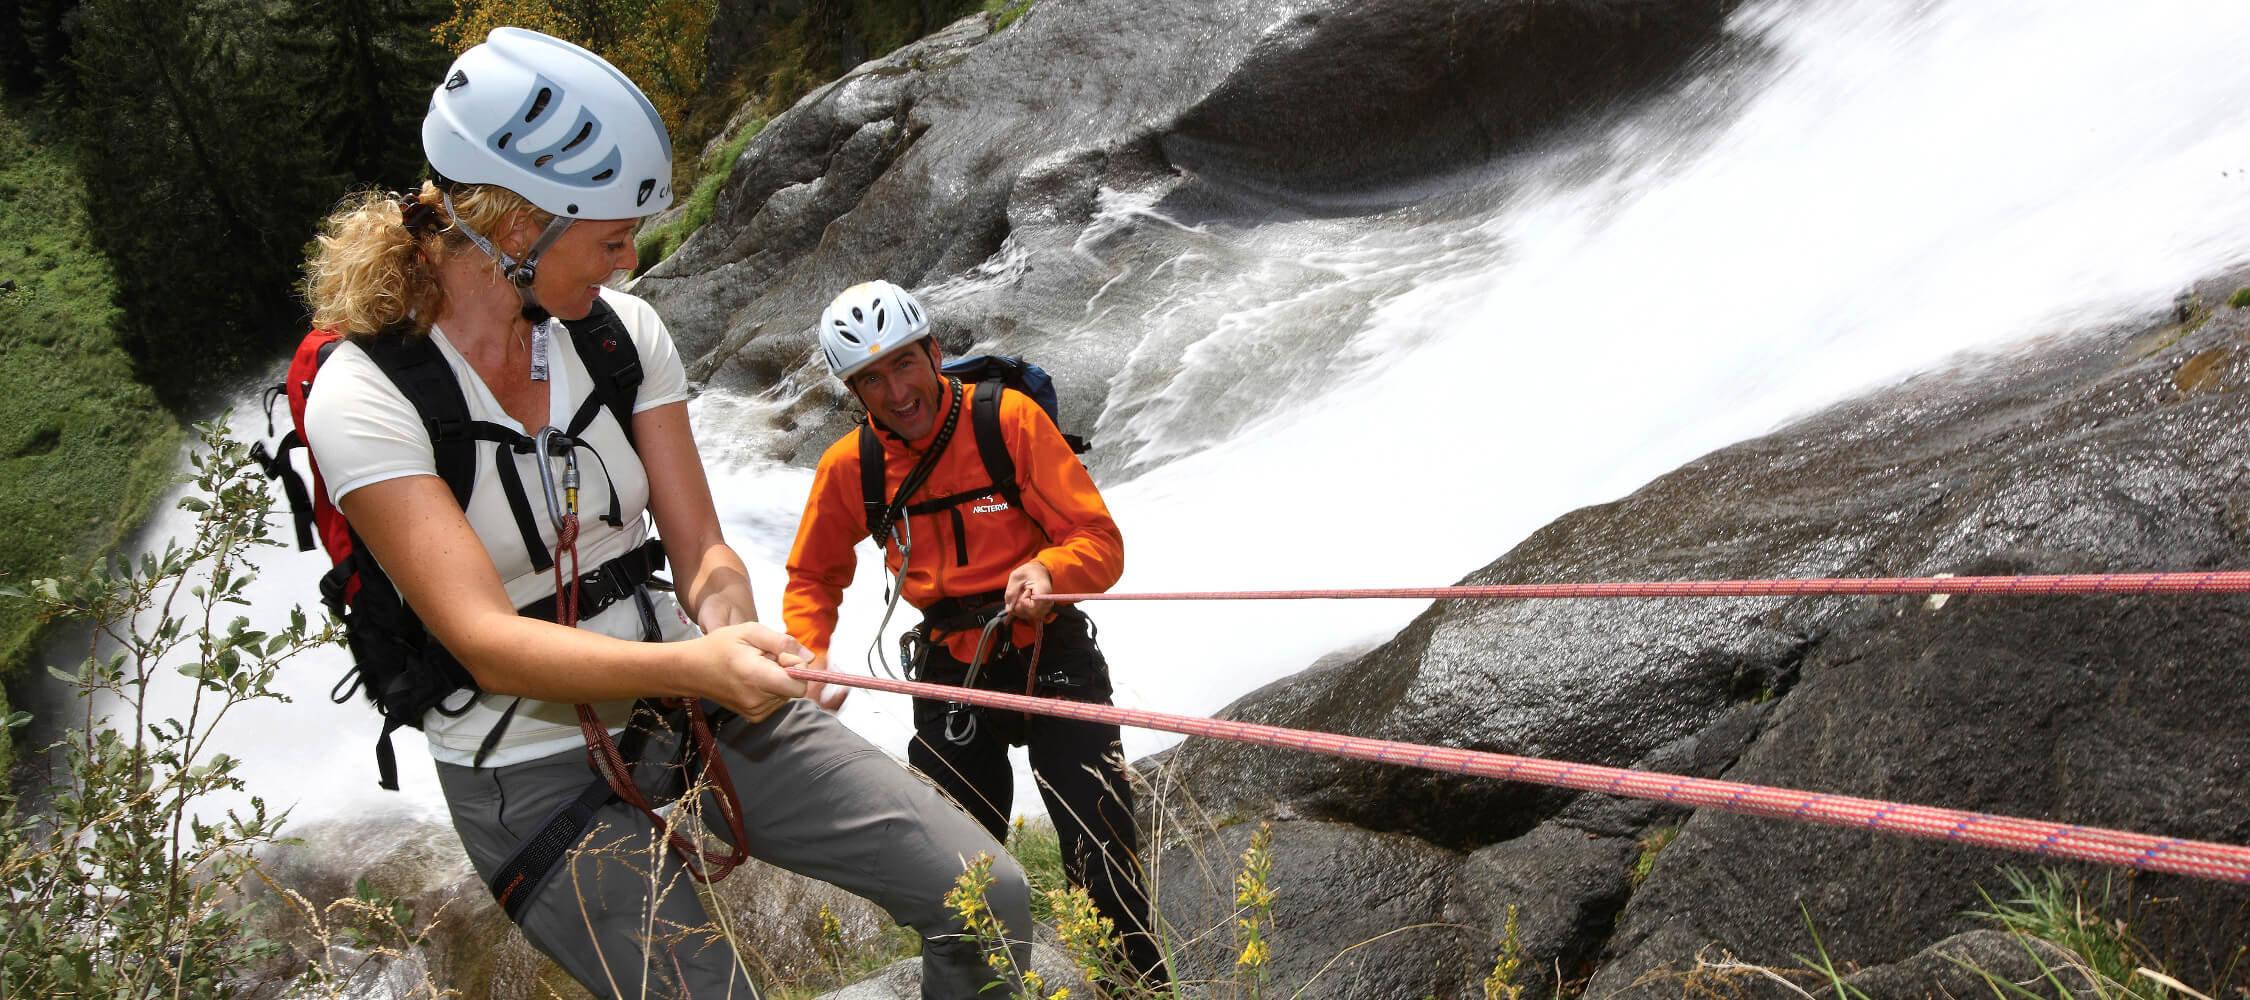 Italien-Trentino_Suedtirol_Alto_Adige_Merano_Meran_Natur_Sport_Sommer_Klettern_Klettersteig_Wasserfall_Partschins_IDM-Alessandro-Trovati_smg00080altr_2250x1000